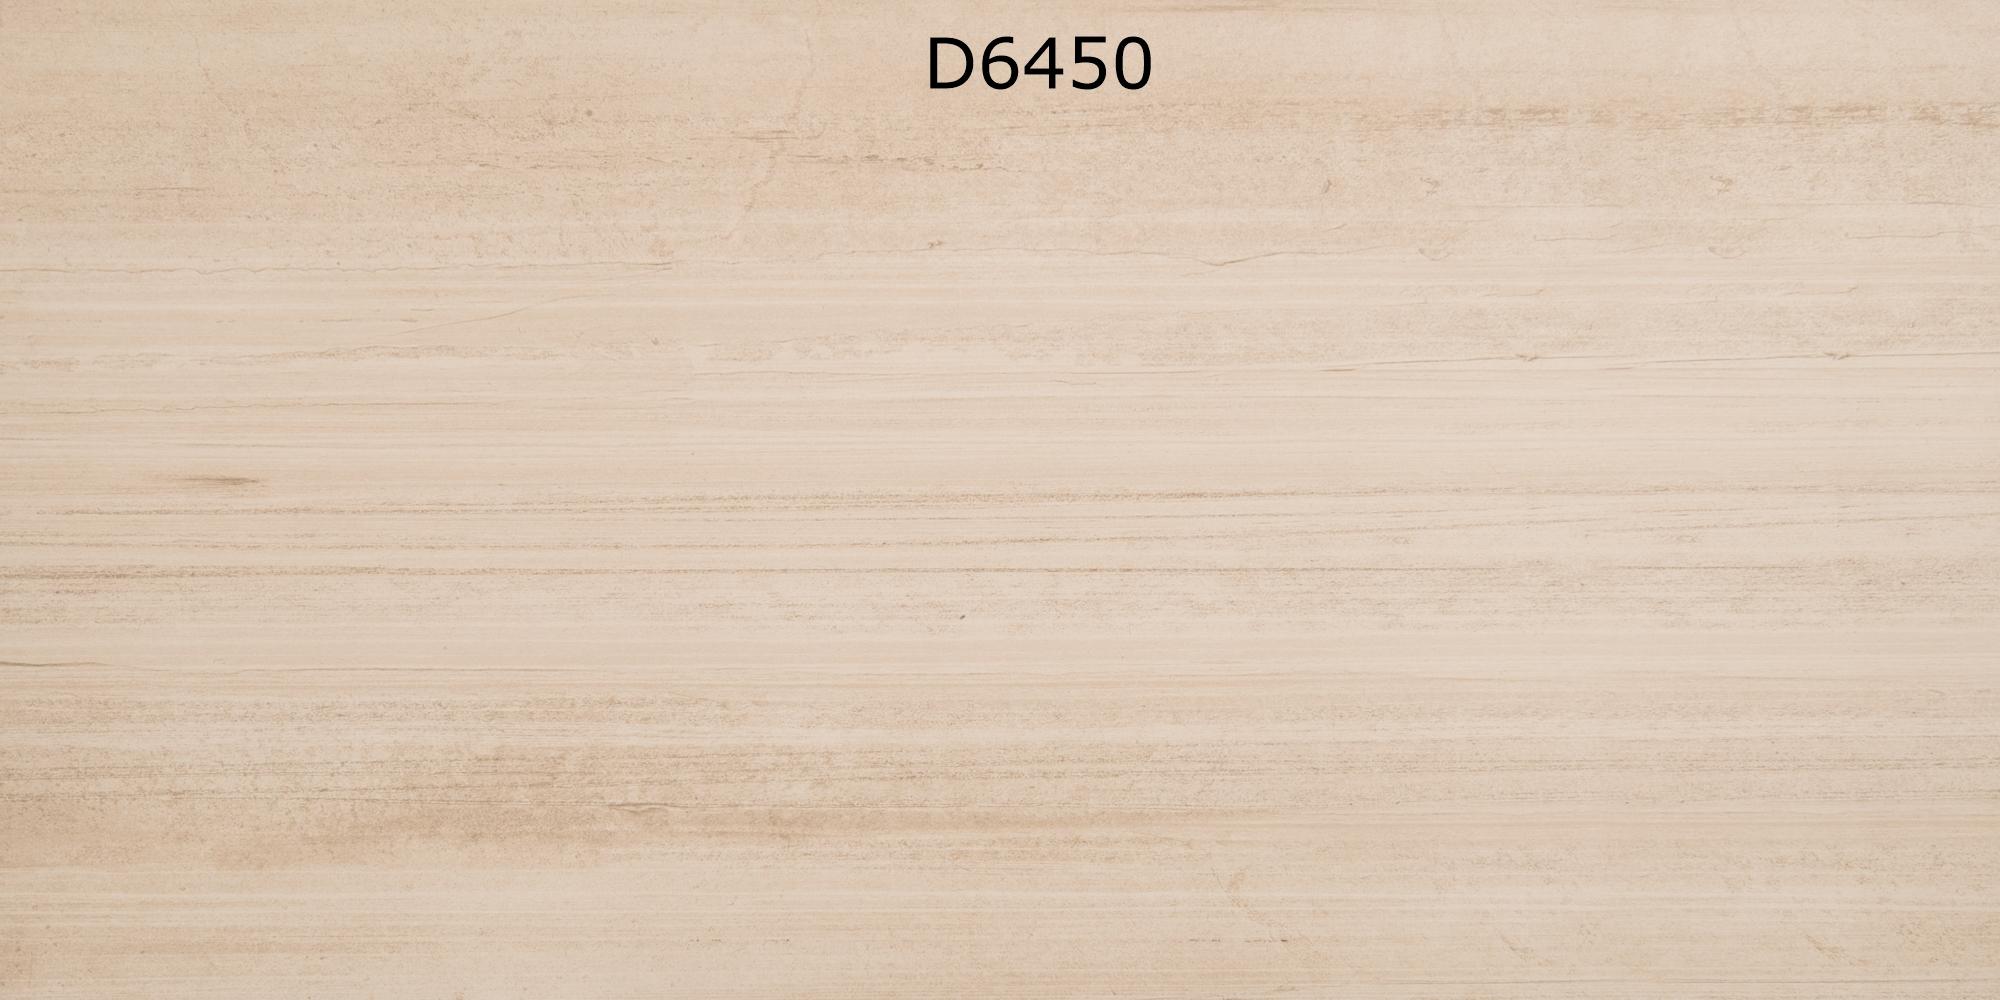 D6450